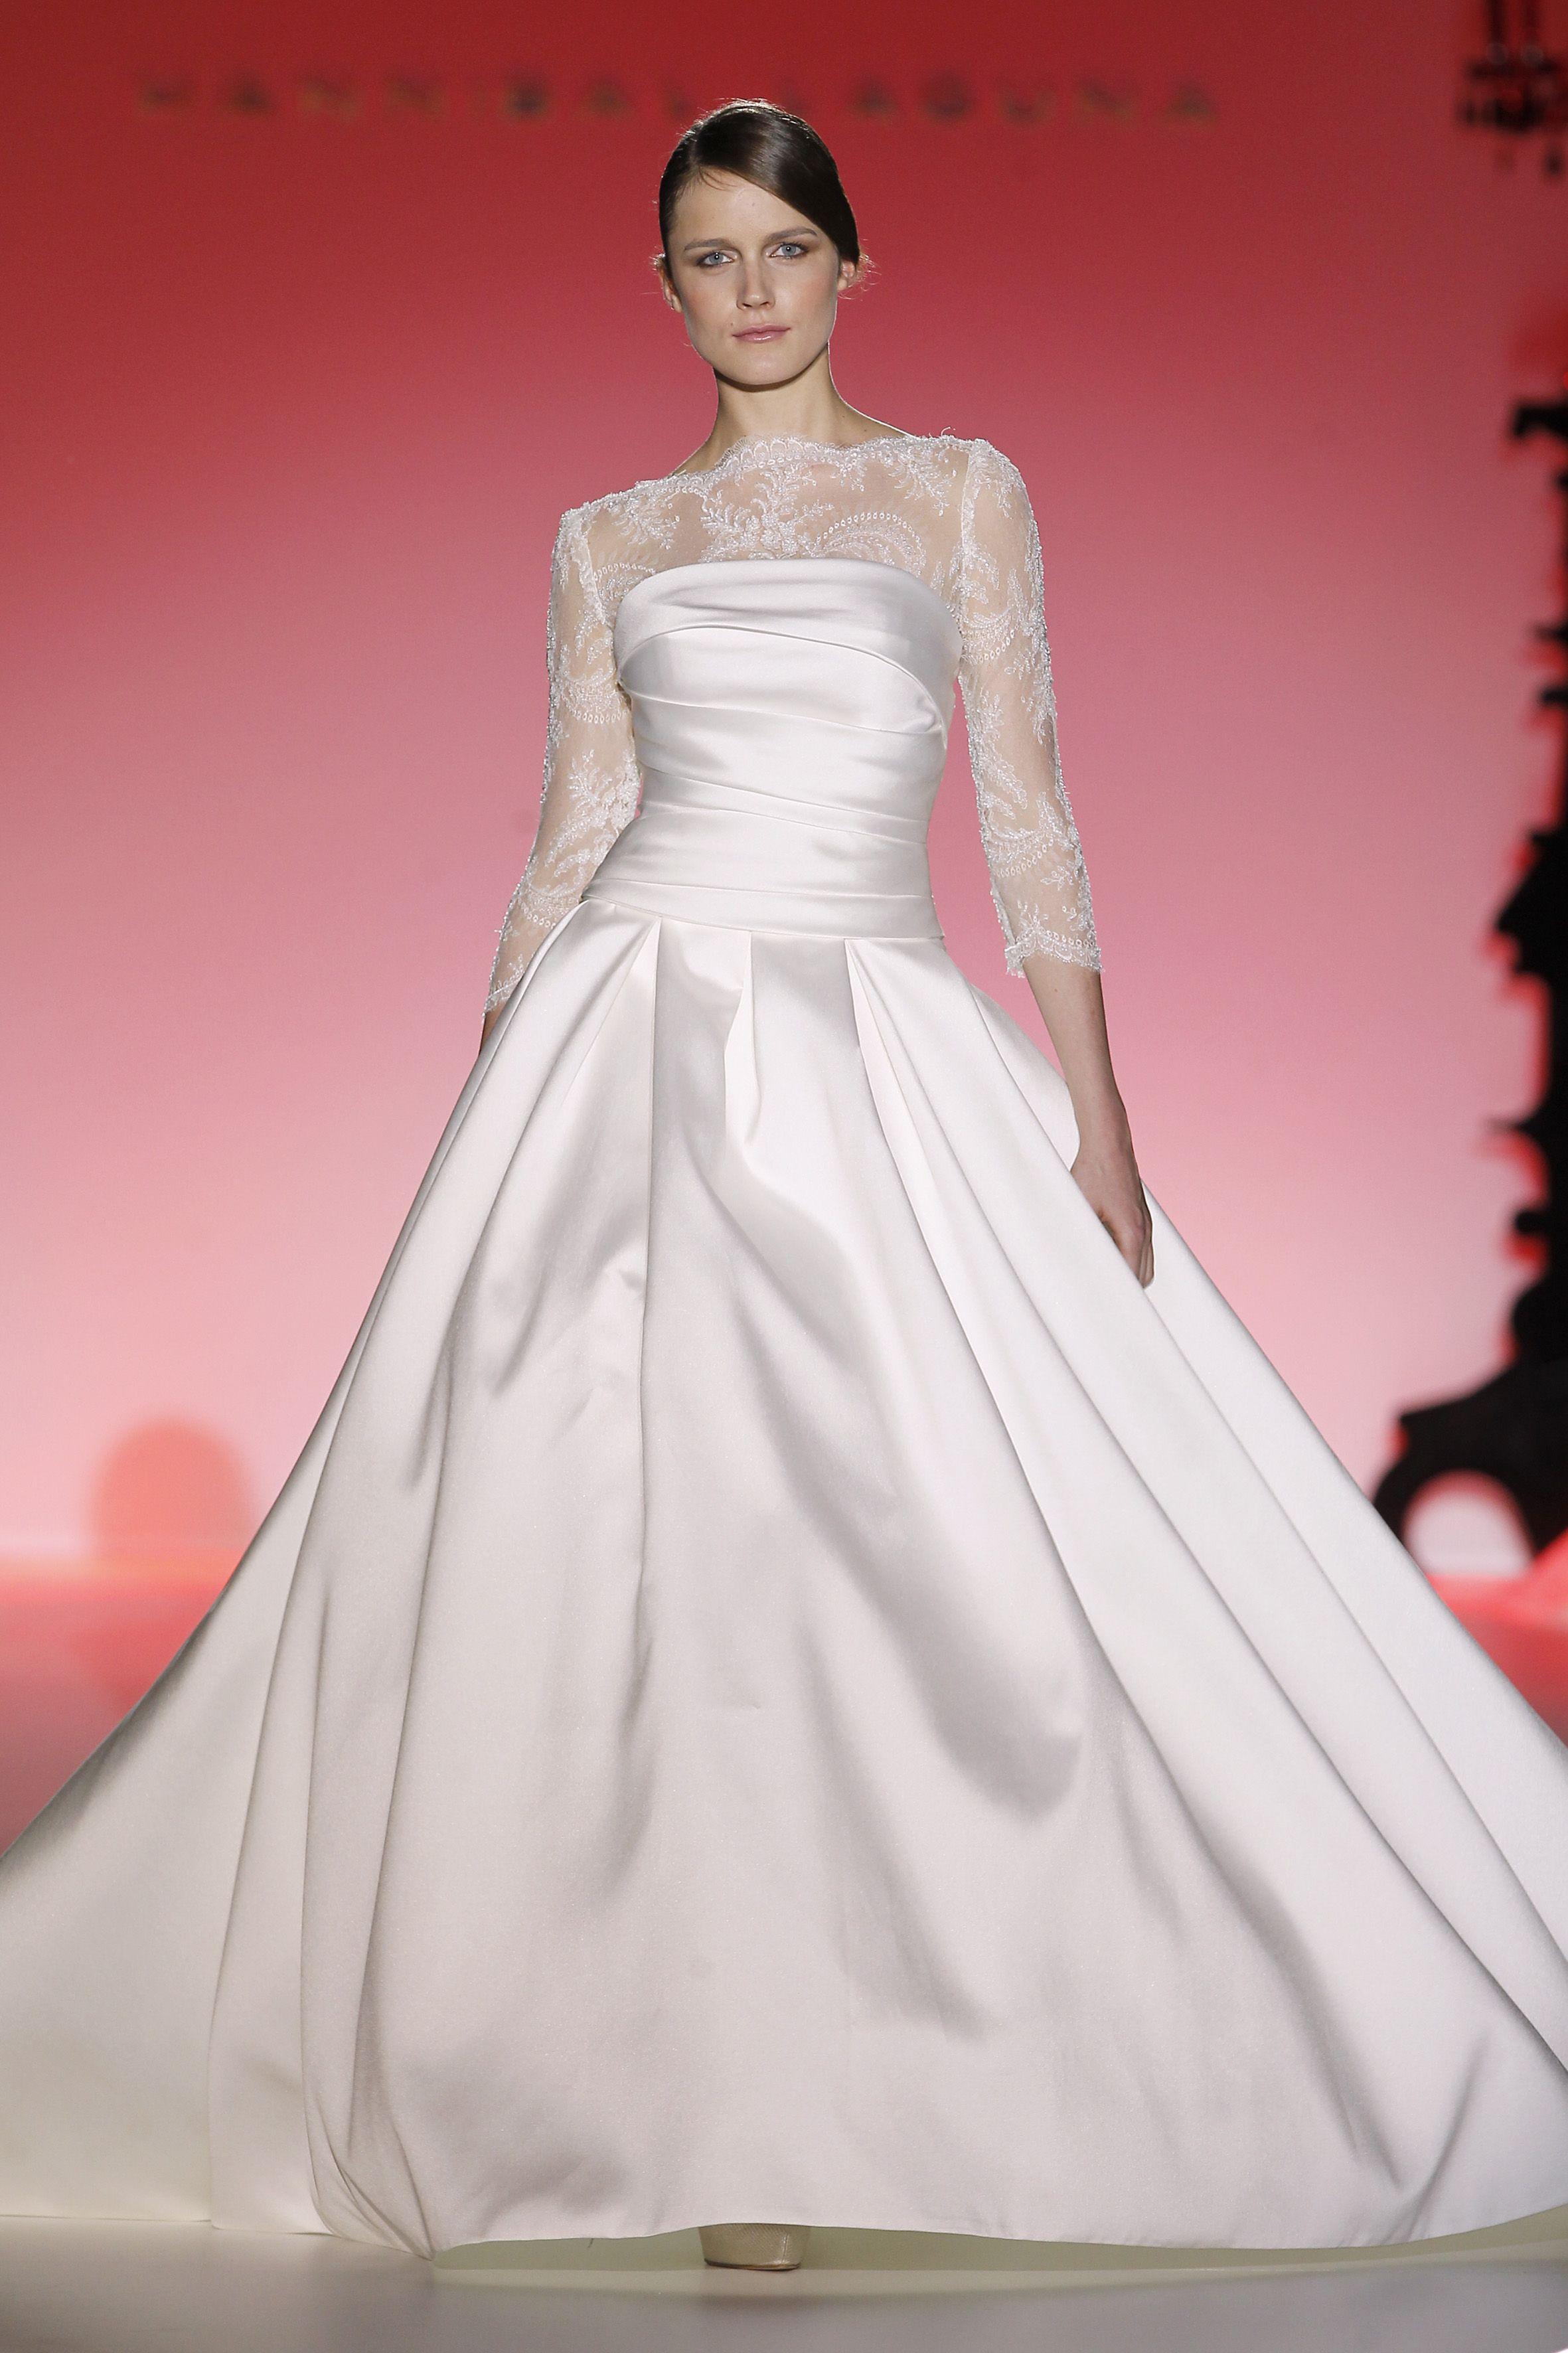 Barcelona bridal week. Diseño: Hannibal Laguna | Barcelona bridal ...